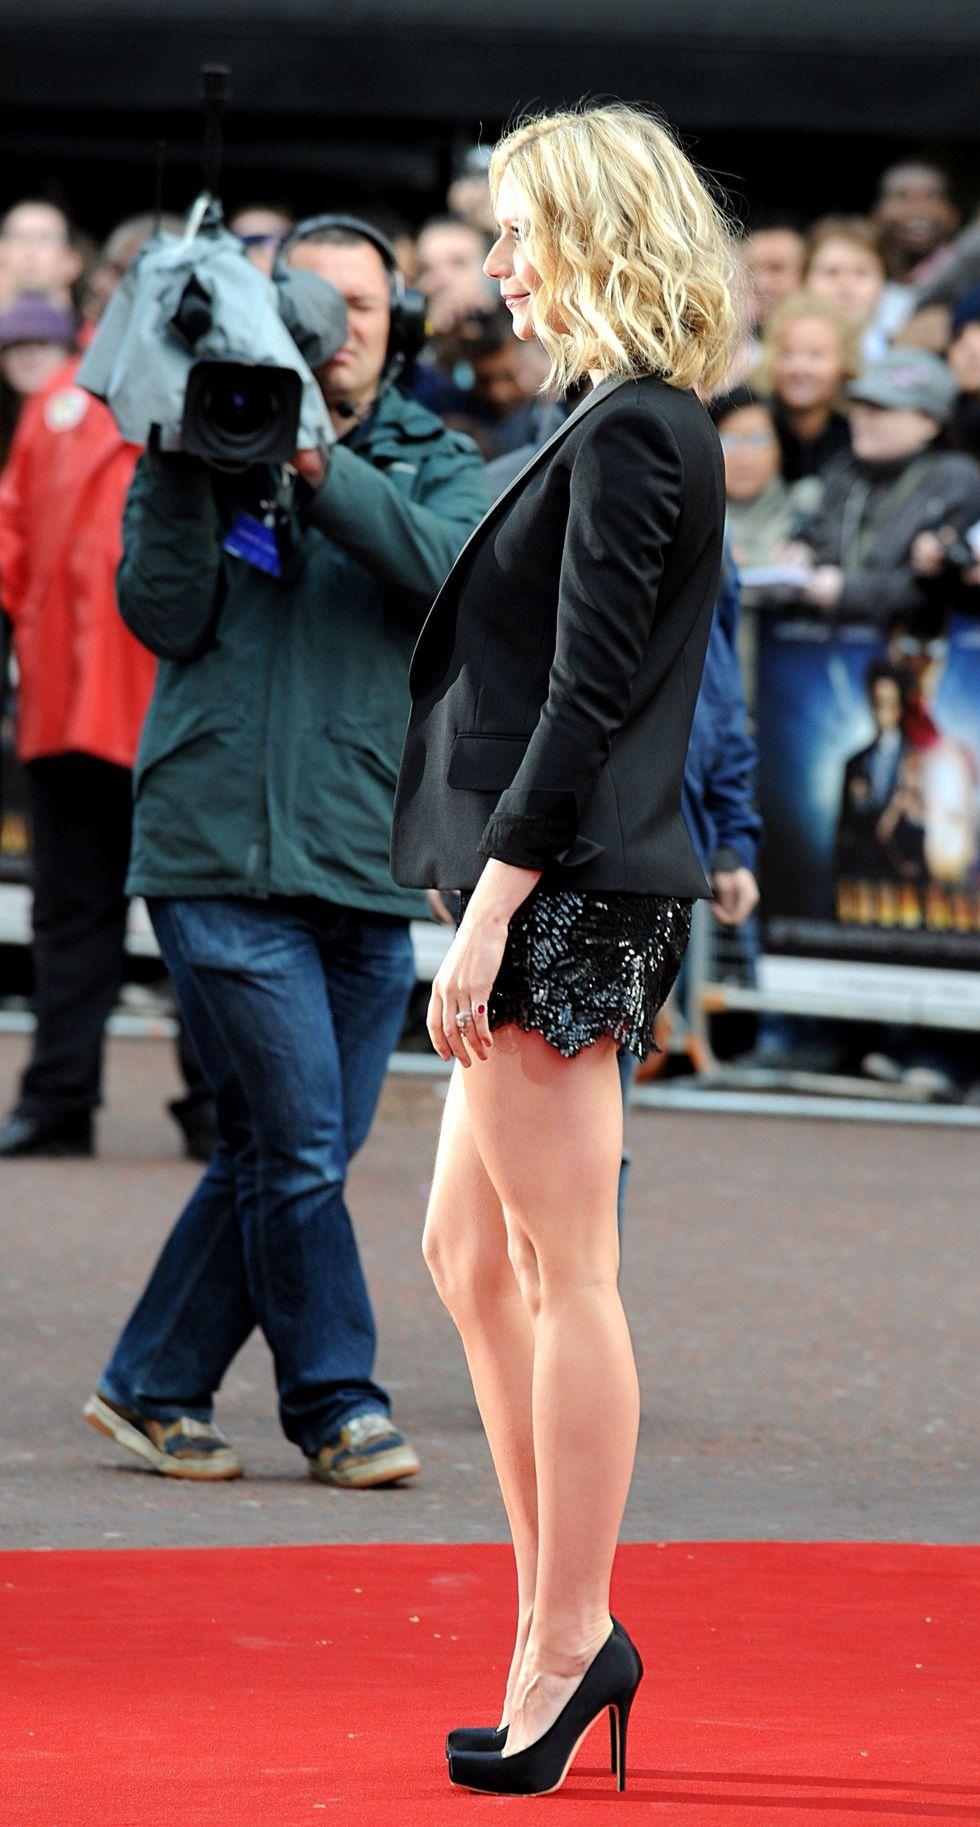 gwyneth-paltrow-iron-man-uk-premiere-in-london-05